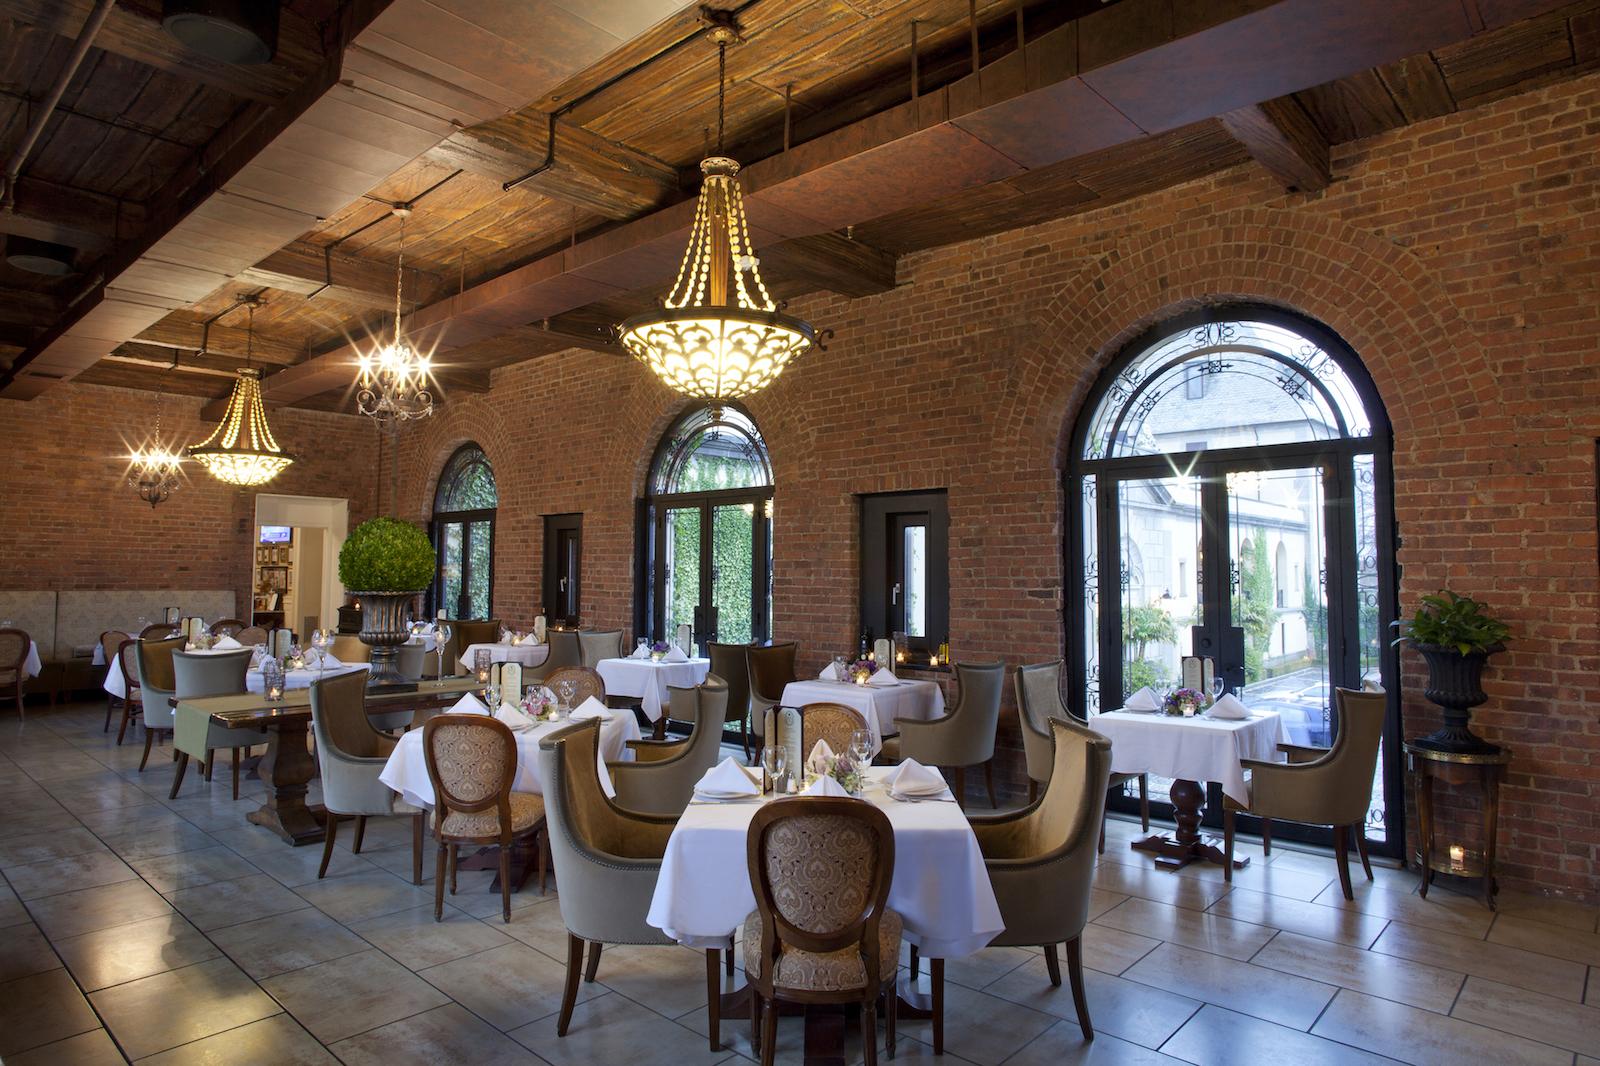 5 Long Island Romantic Restaurants for Date Night Perfection